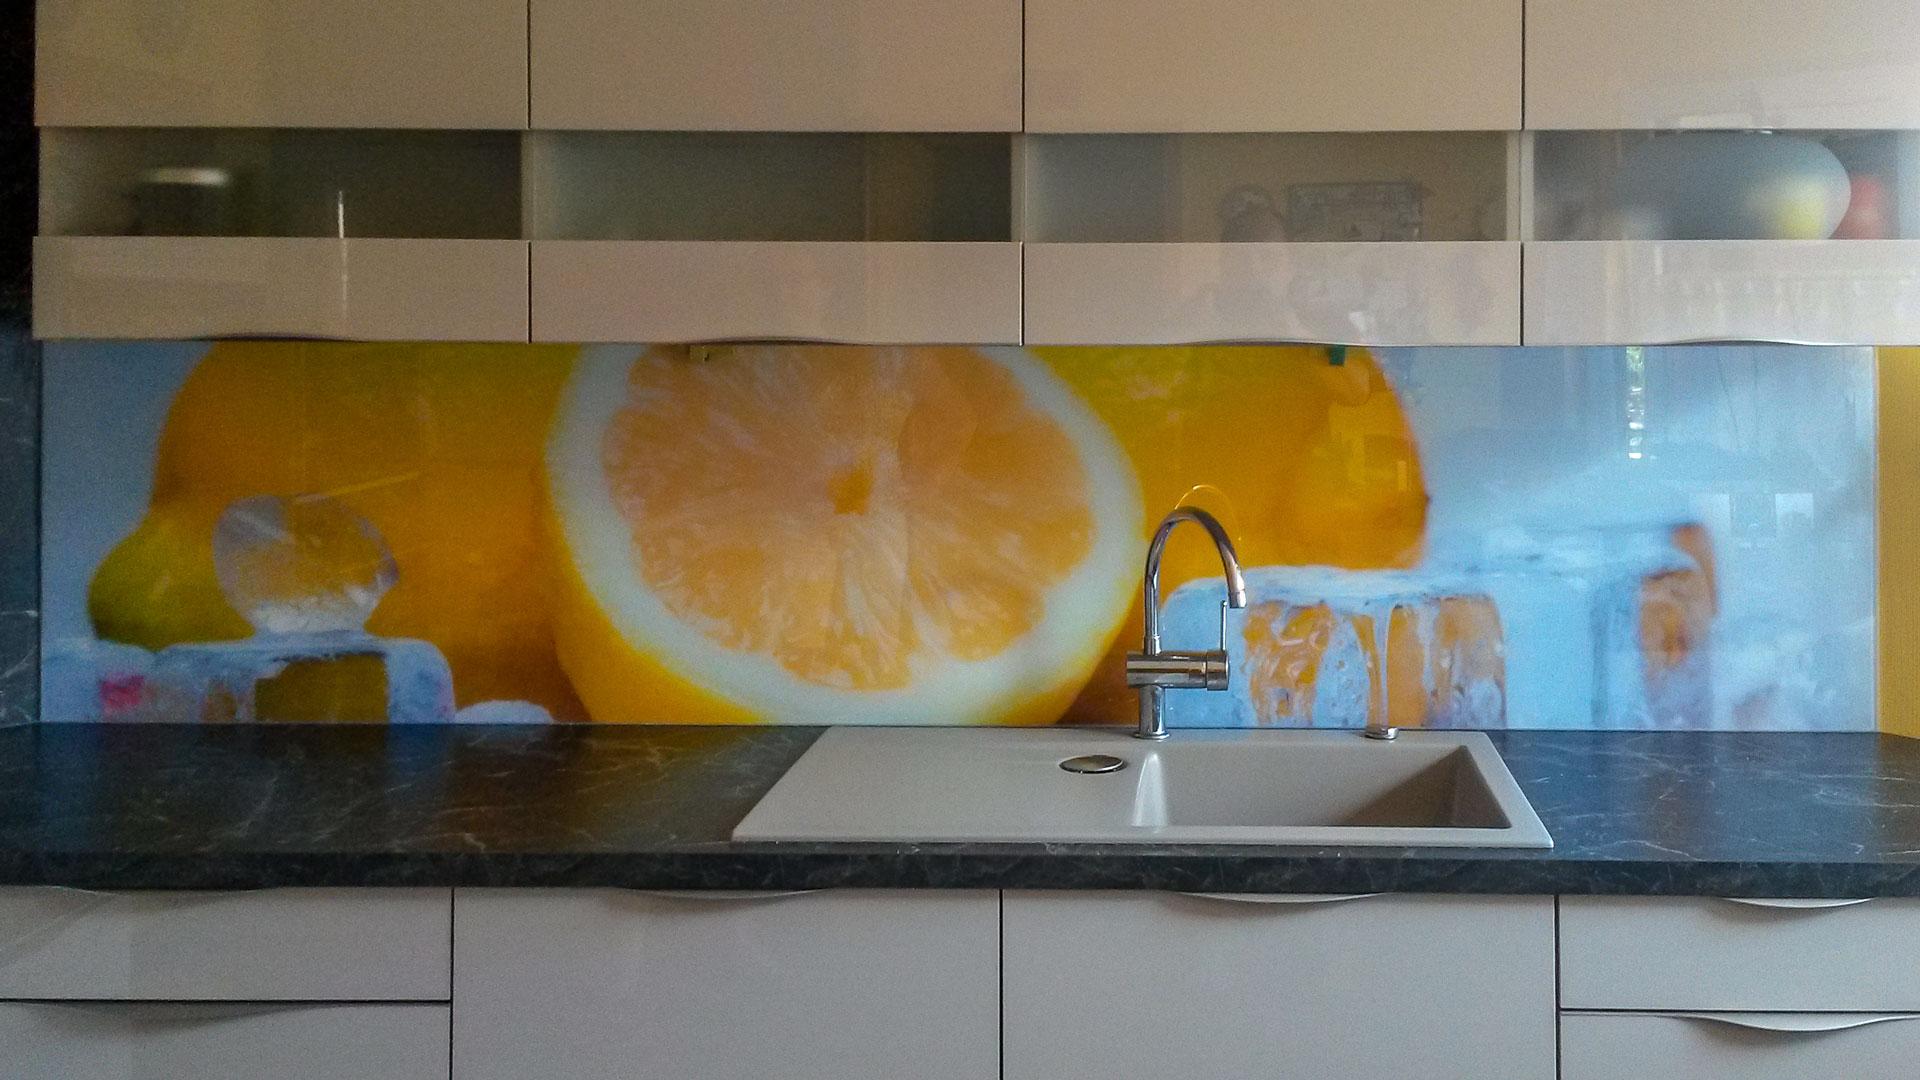 Kuchenruckwand Zitrone Kuchenruckwand Zitronen Nischenruckwand